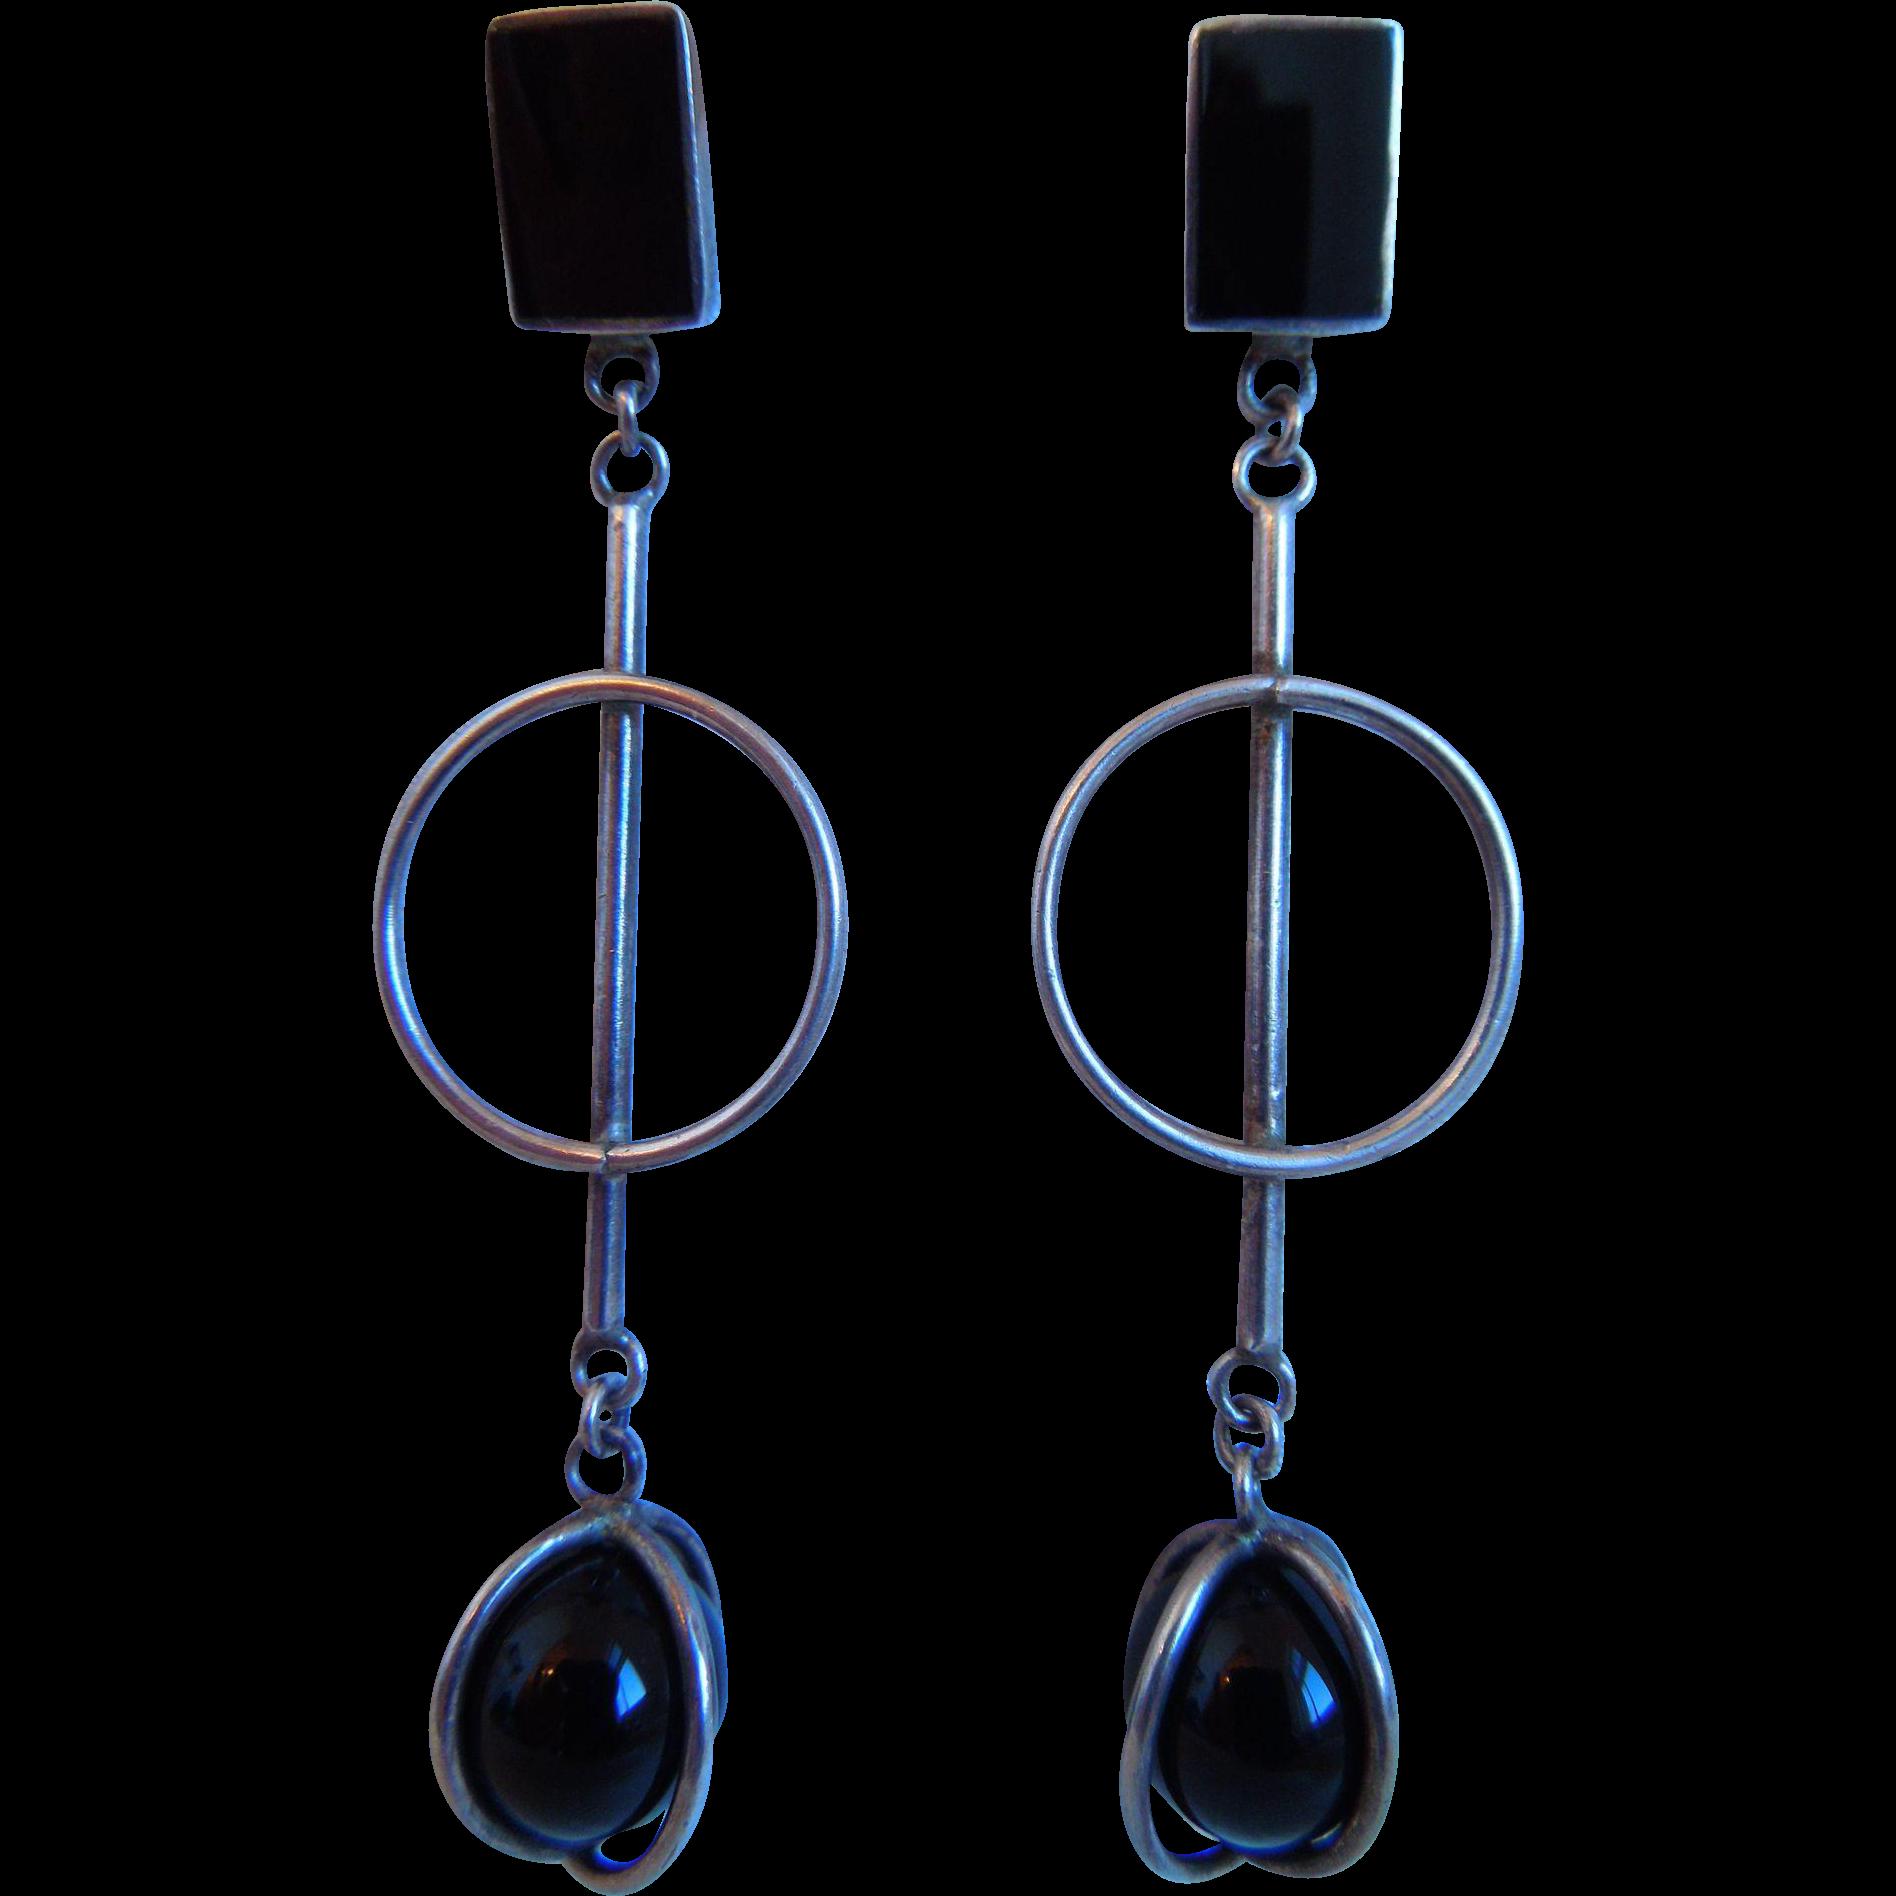 Vintage Long Sterling Silver And Black Onyx Modernist Pierced Earrings, 925